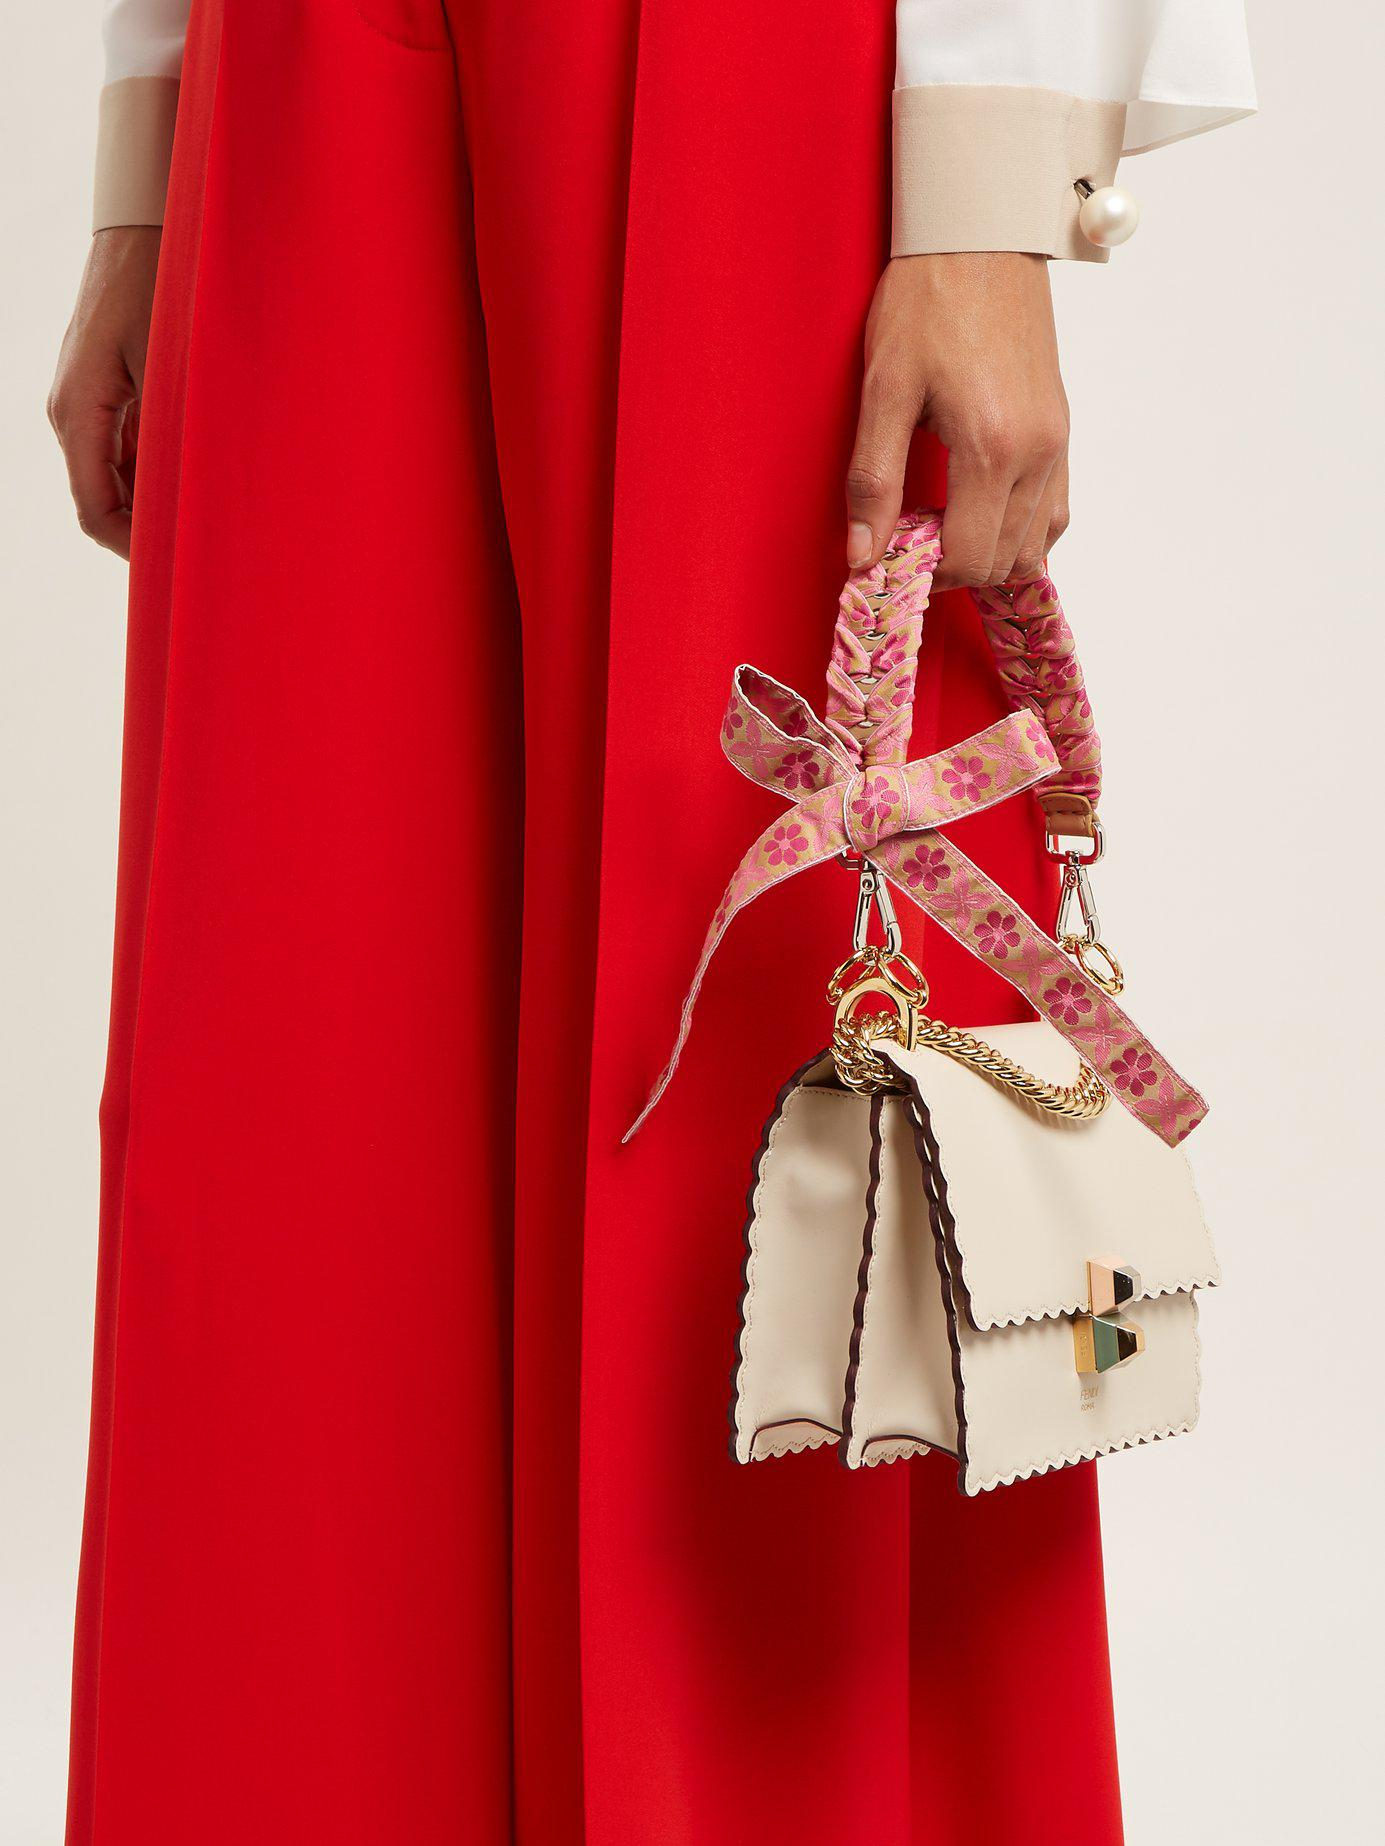 4332a5d6f543 Fendi - Pink Strap You Whipstitched Ribbon Short Bag Strap - Lyst. View  fullscreen